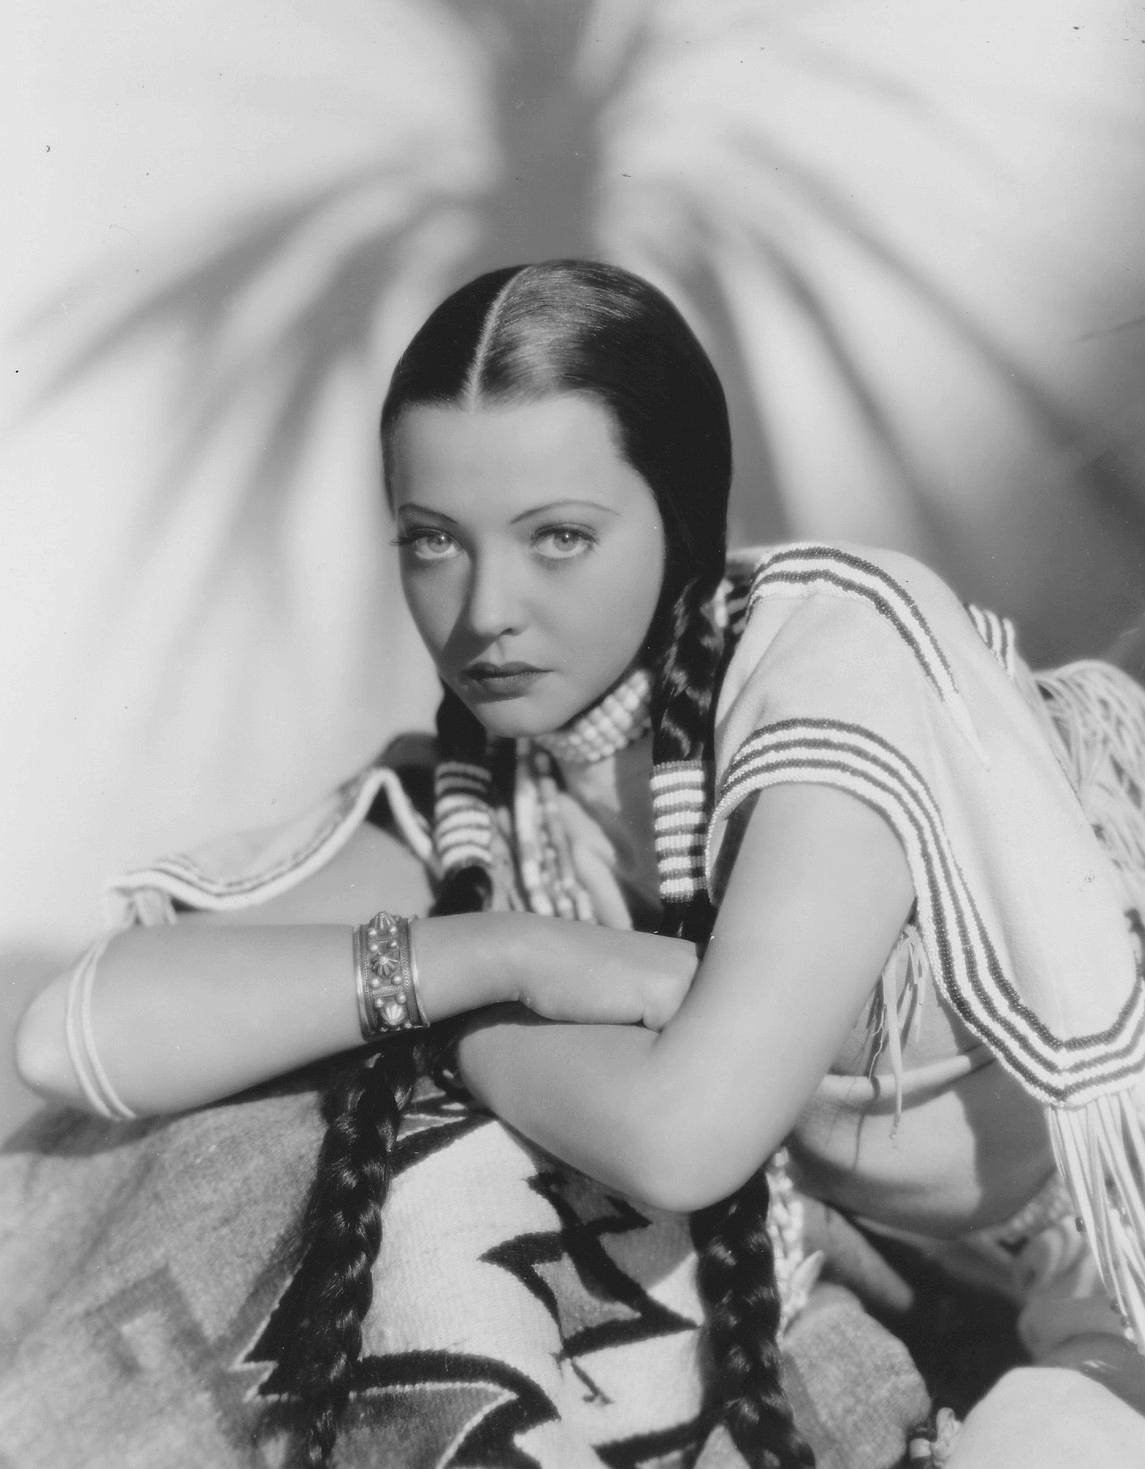 Sylvia Sydney, actress from the1930s